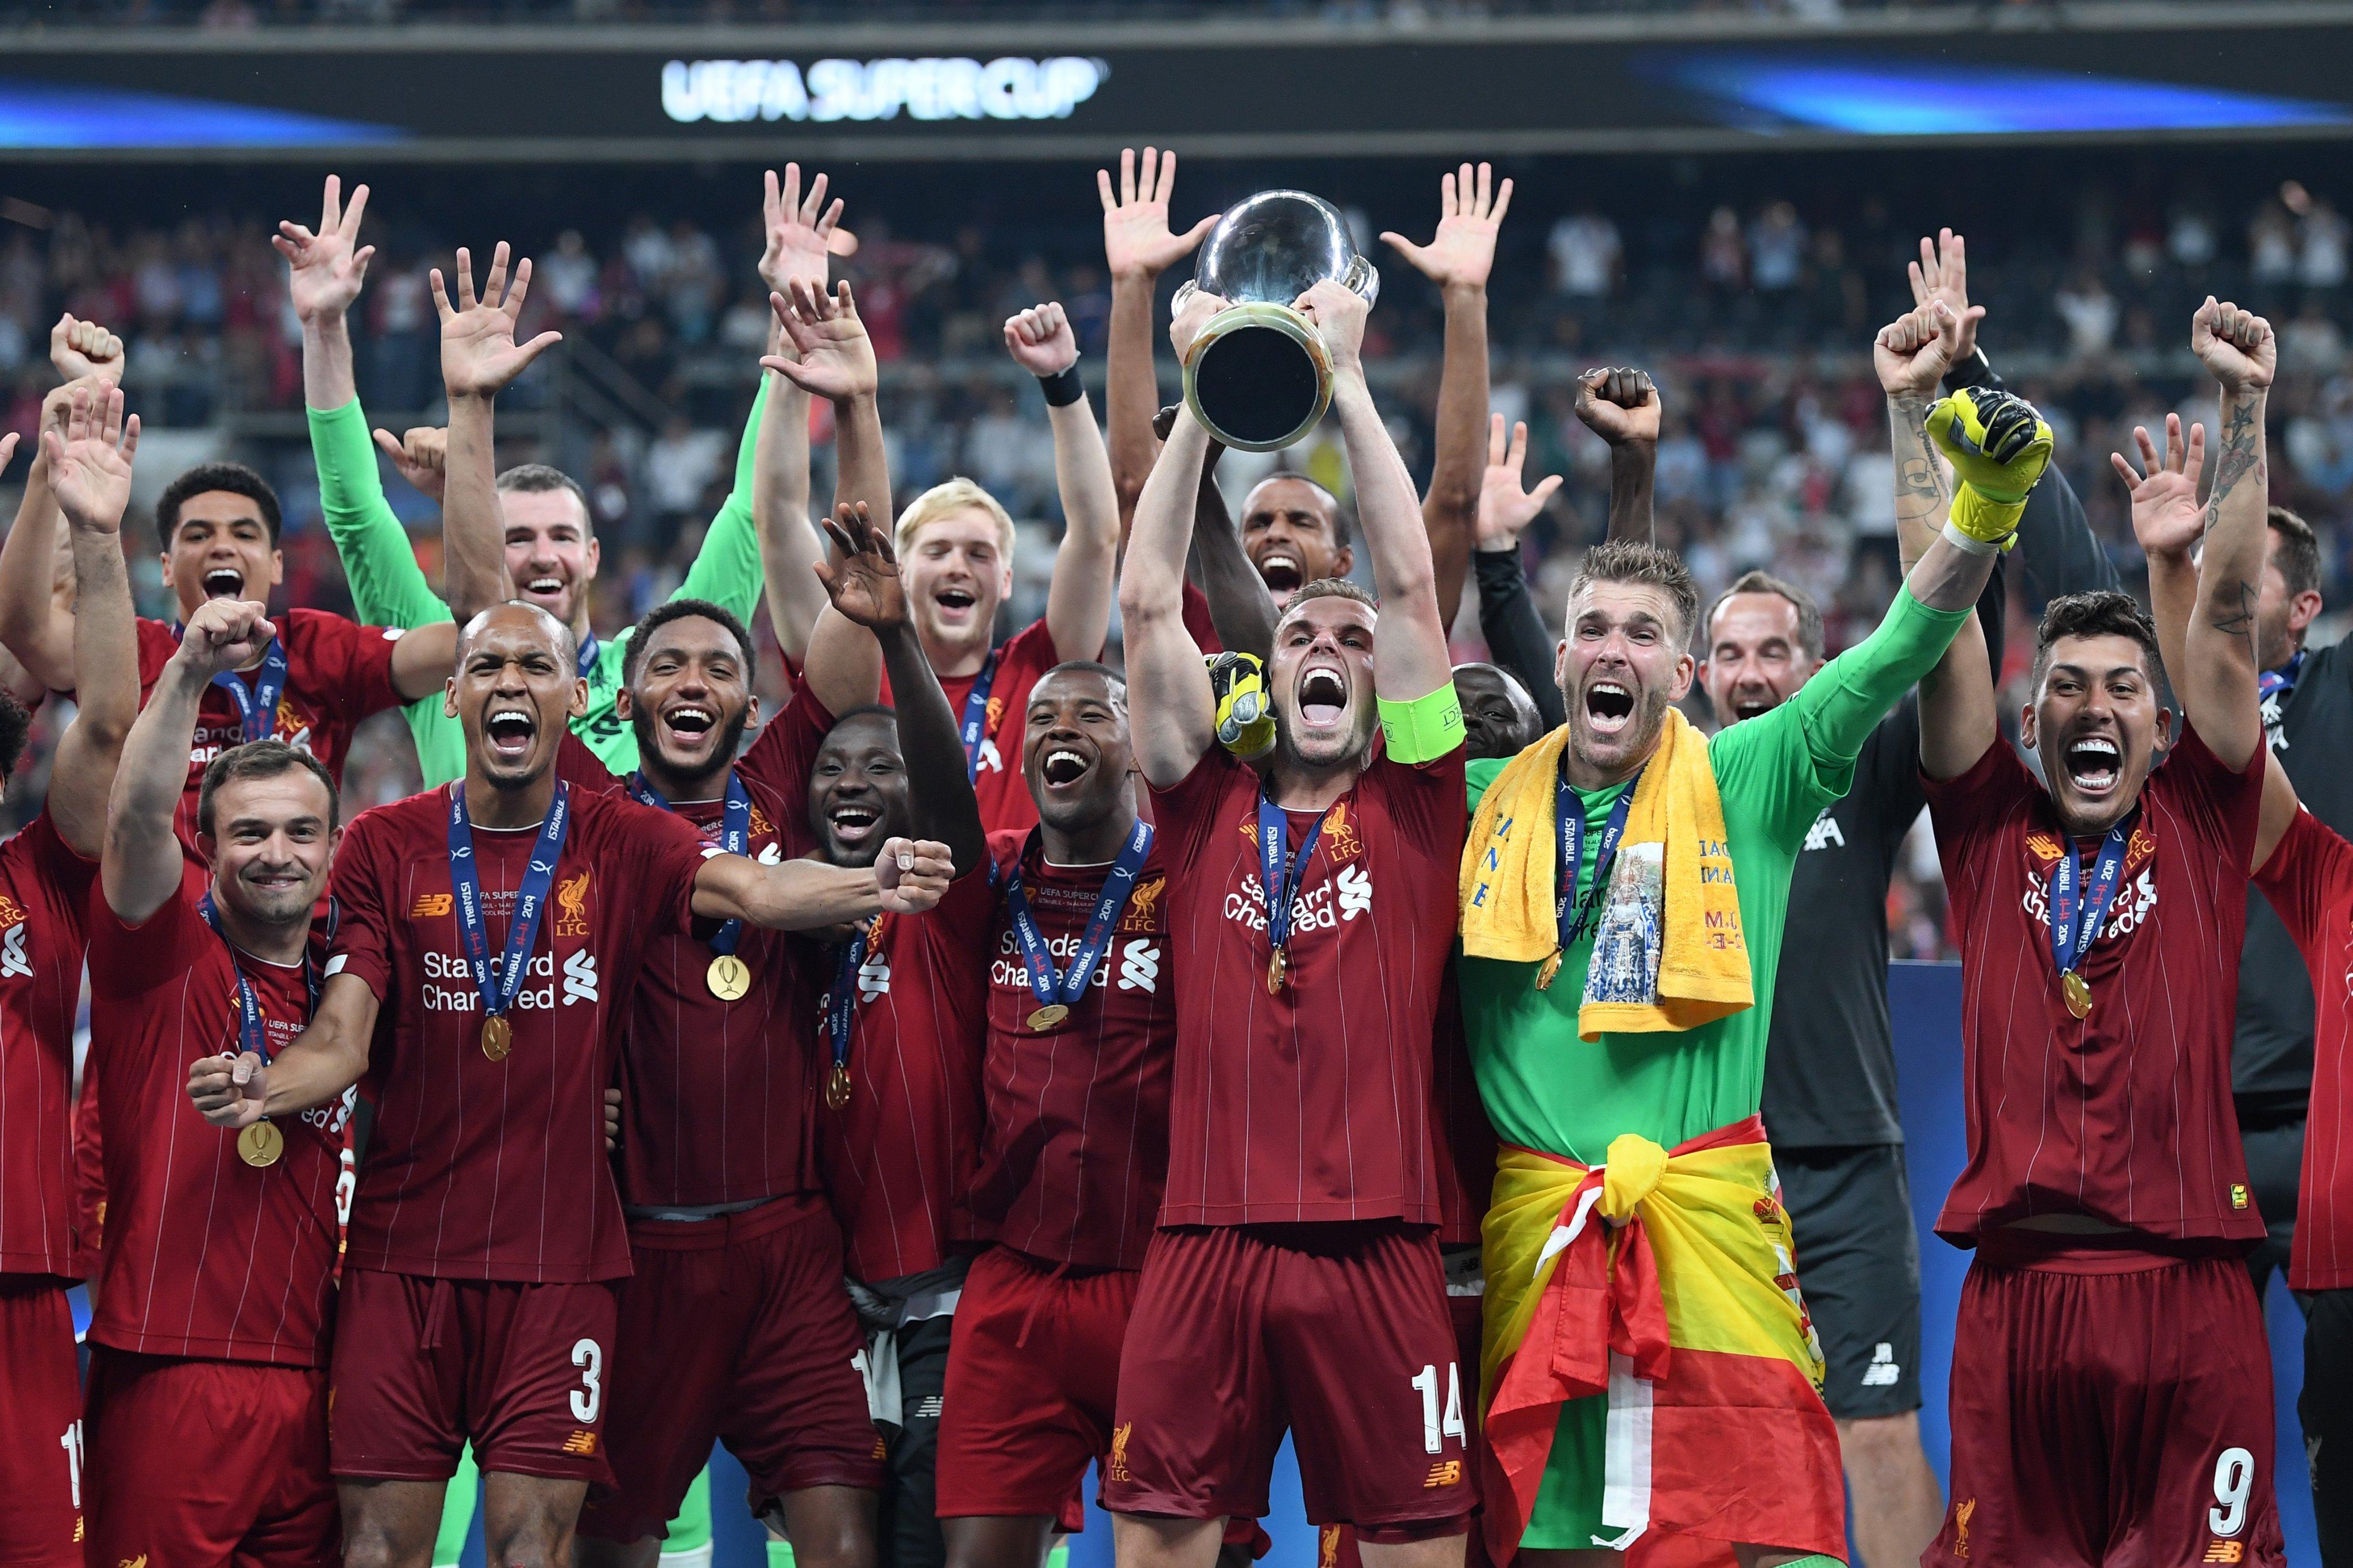 UEFA Super Cup 2019: Liverpool Beats Chelsea 5 – 4 on Penalties